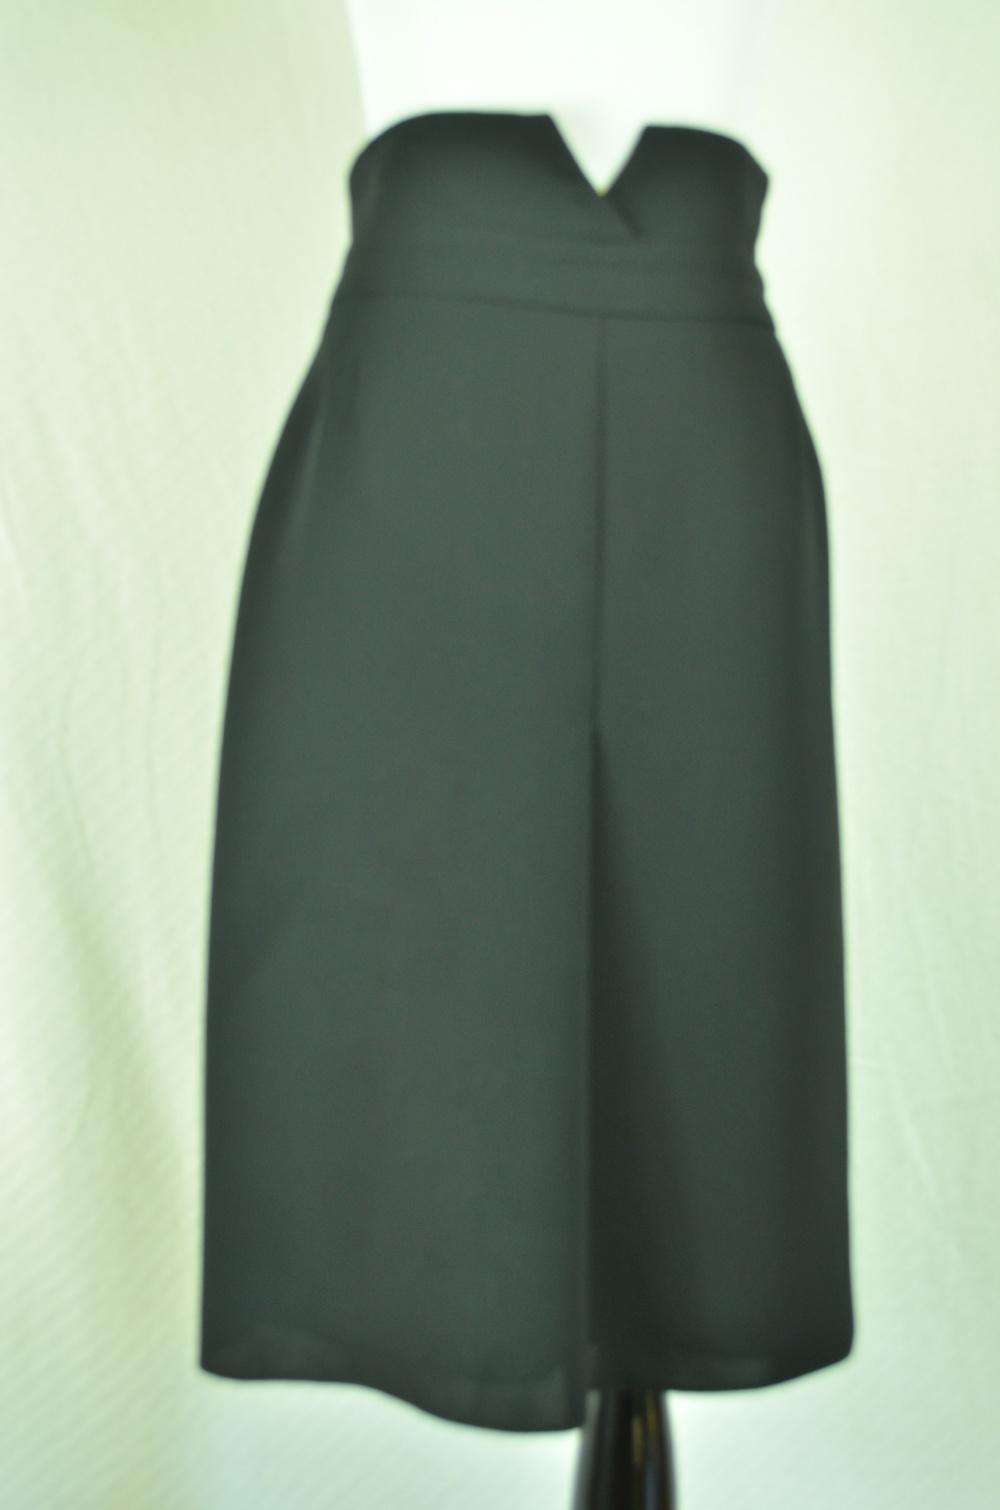 51. Giorgio Armani High-Waister Skirt